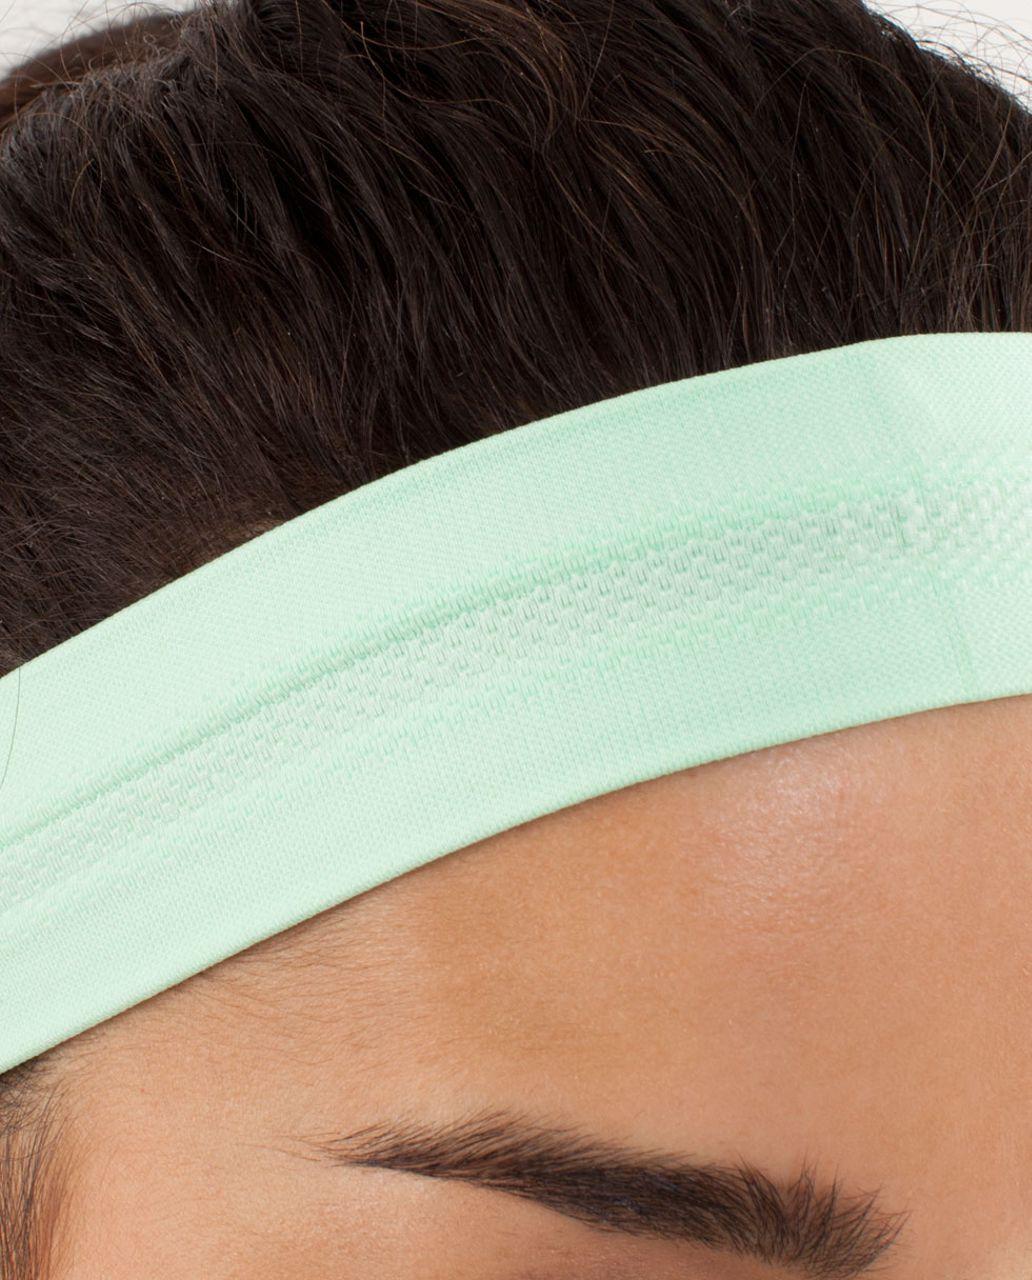 Lululemon Swiftly Headband - Fresh Teal